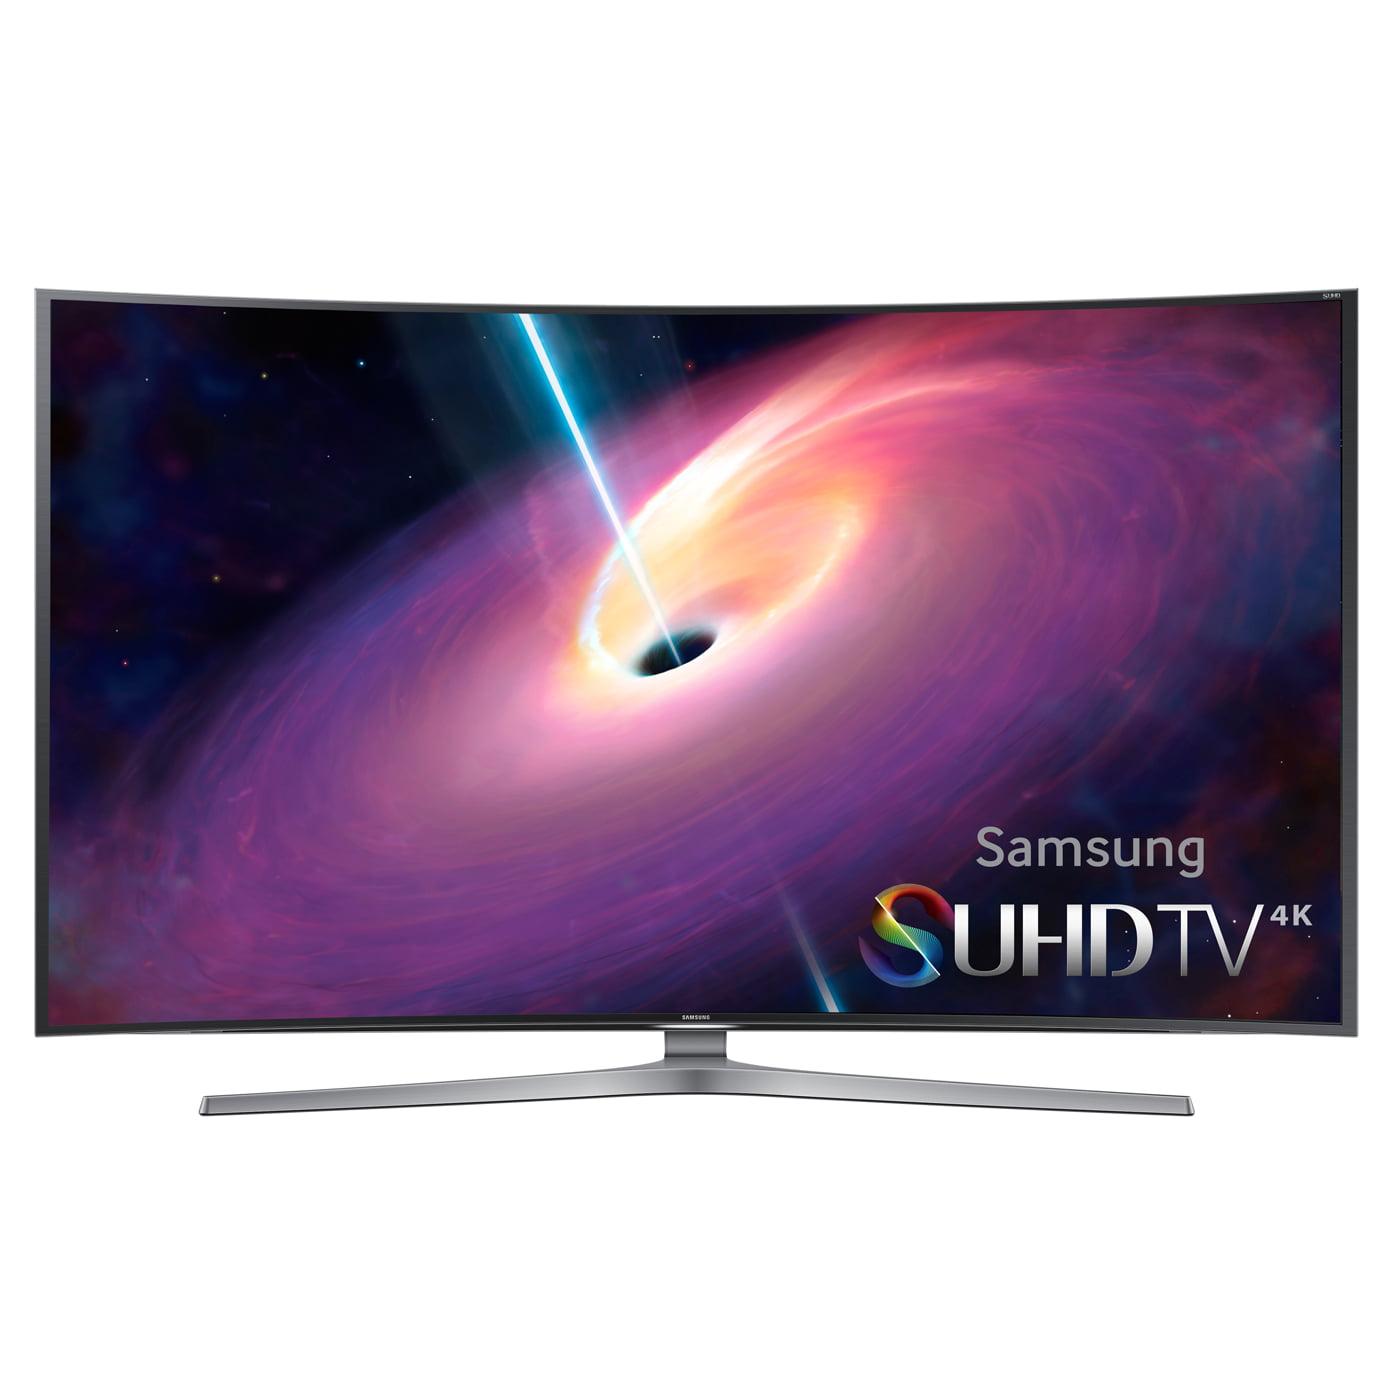 "Samsung UN65JS9000 65"" Class Curved 4K SUHD 3D Smart TV With WiFi"